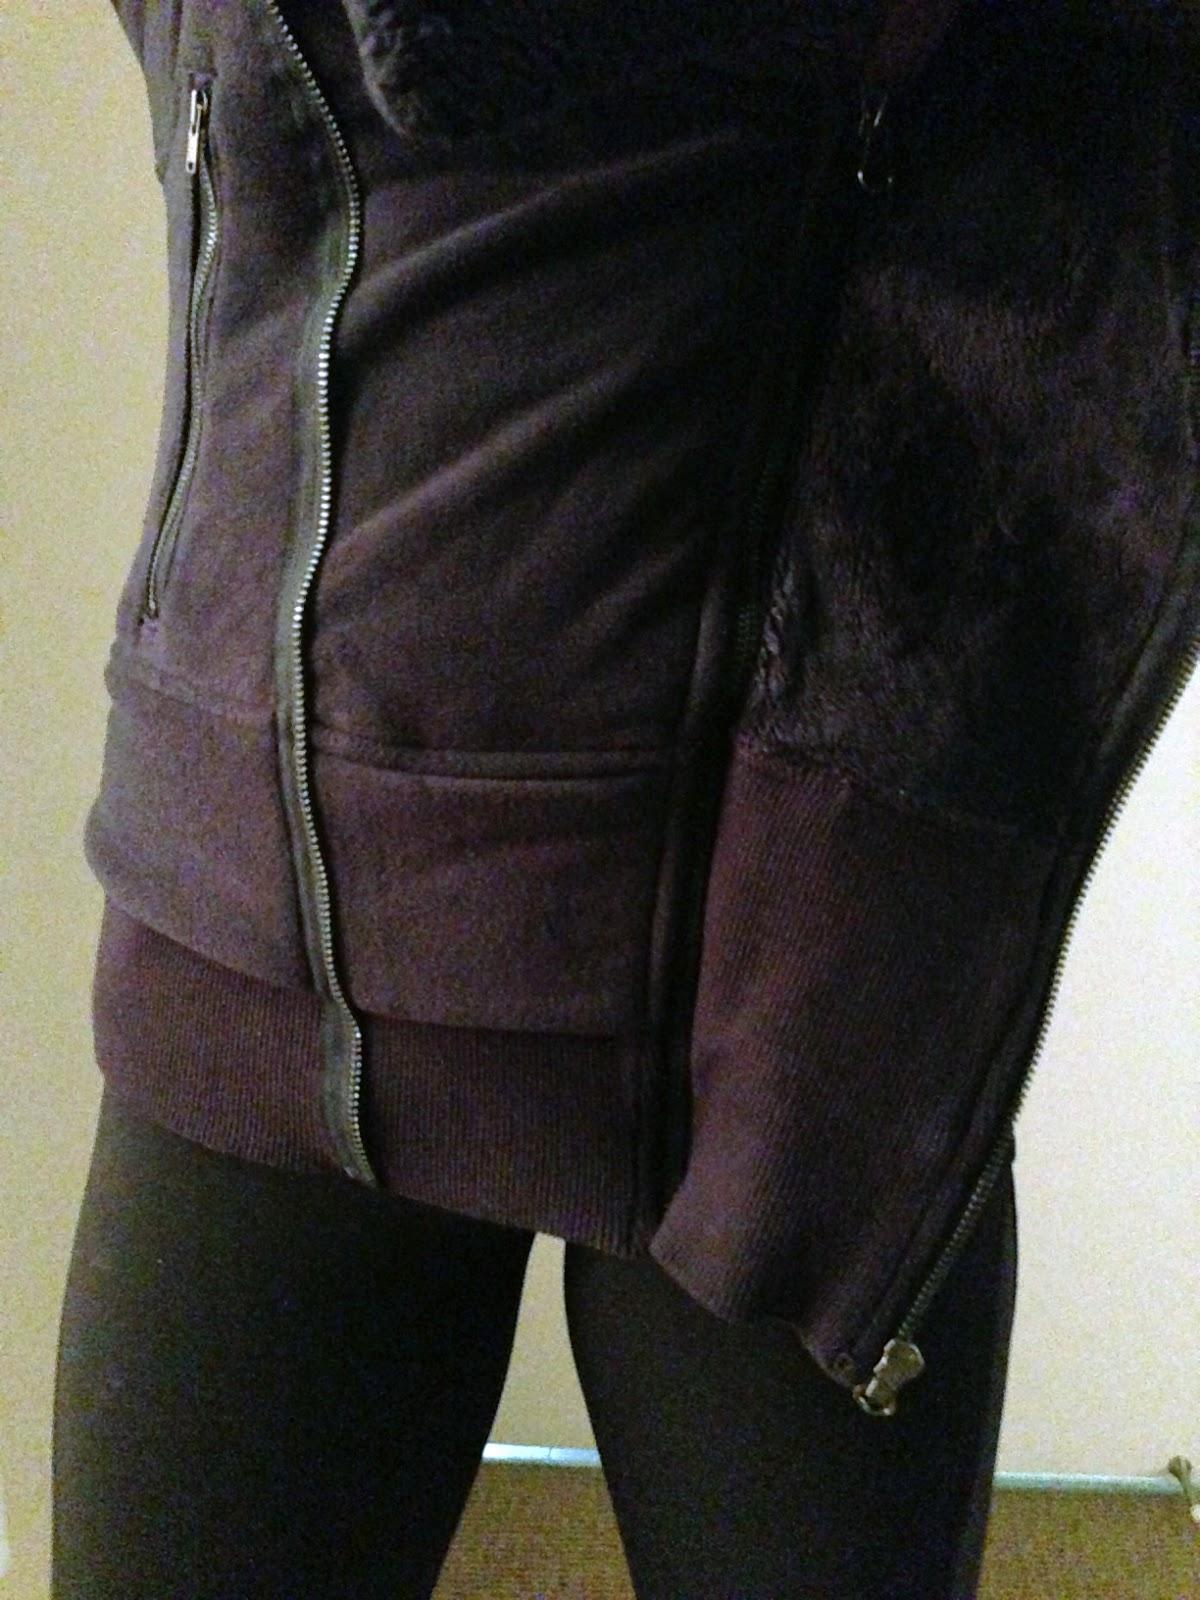 How to blazer a wear with jeans